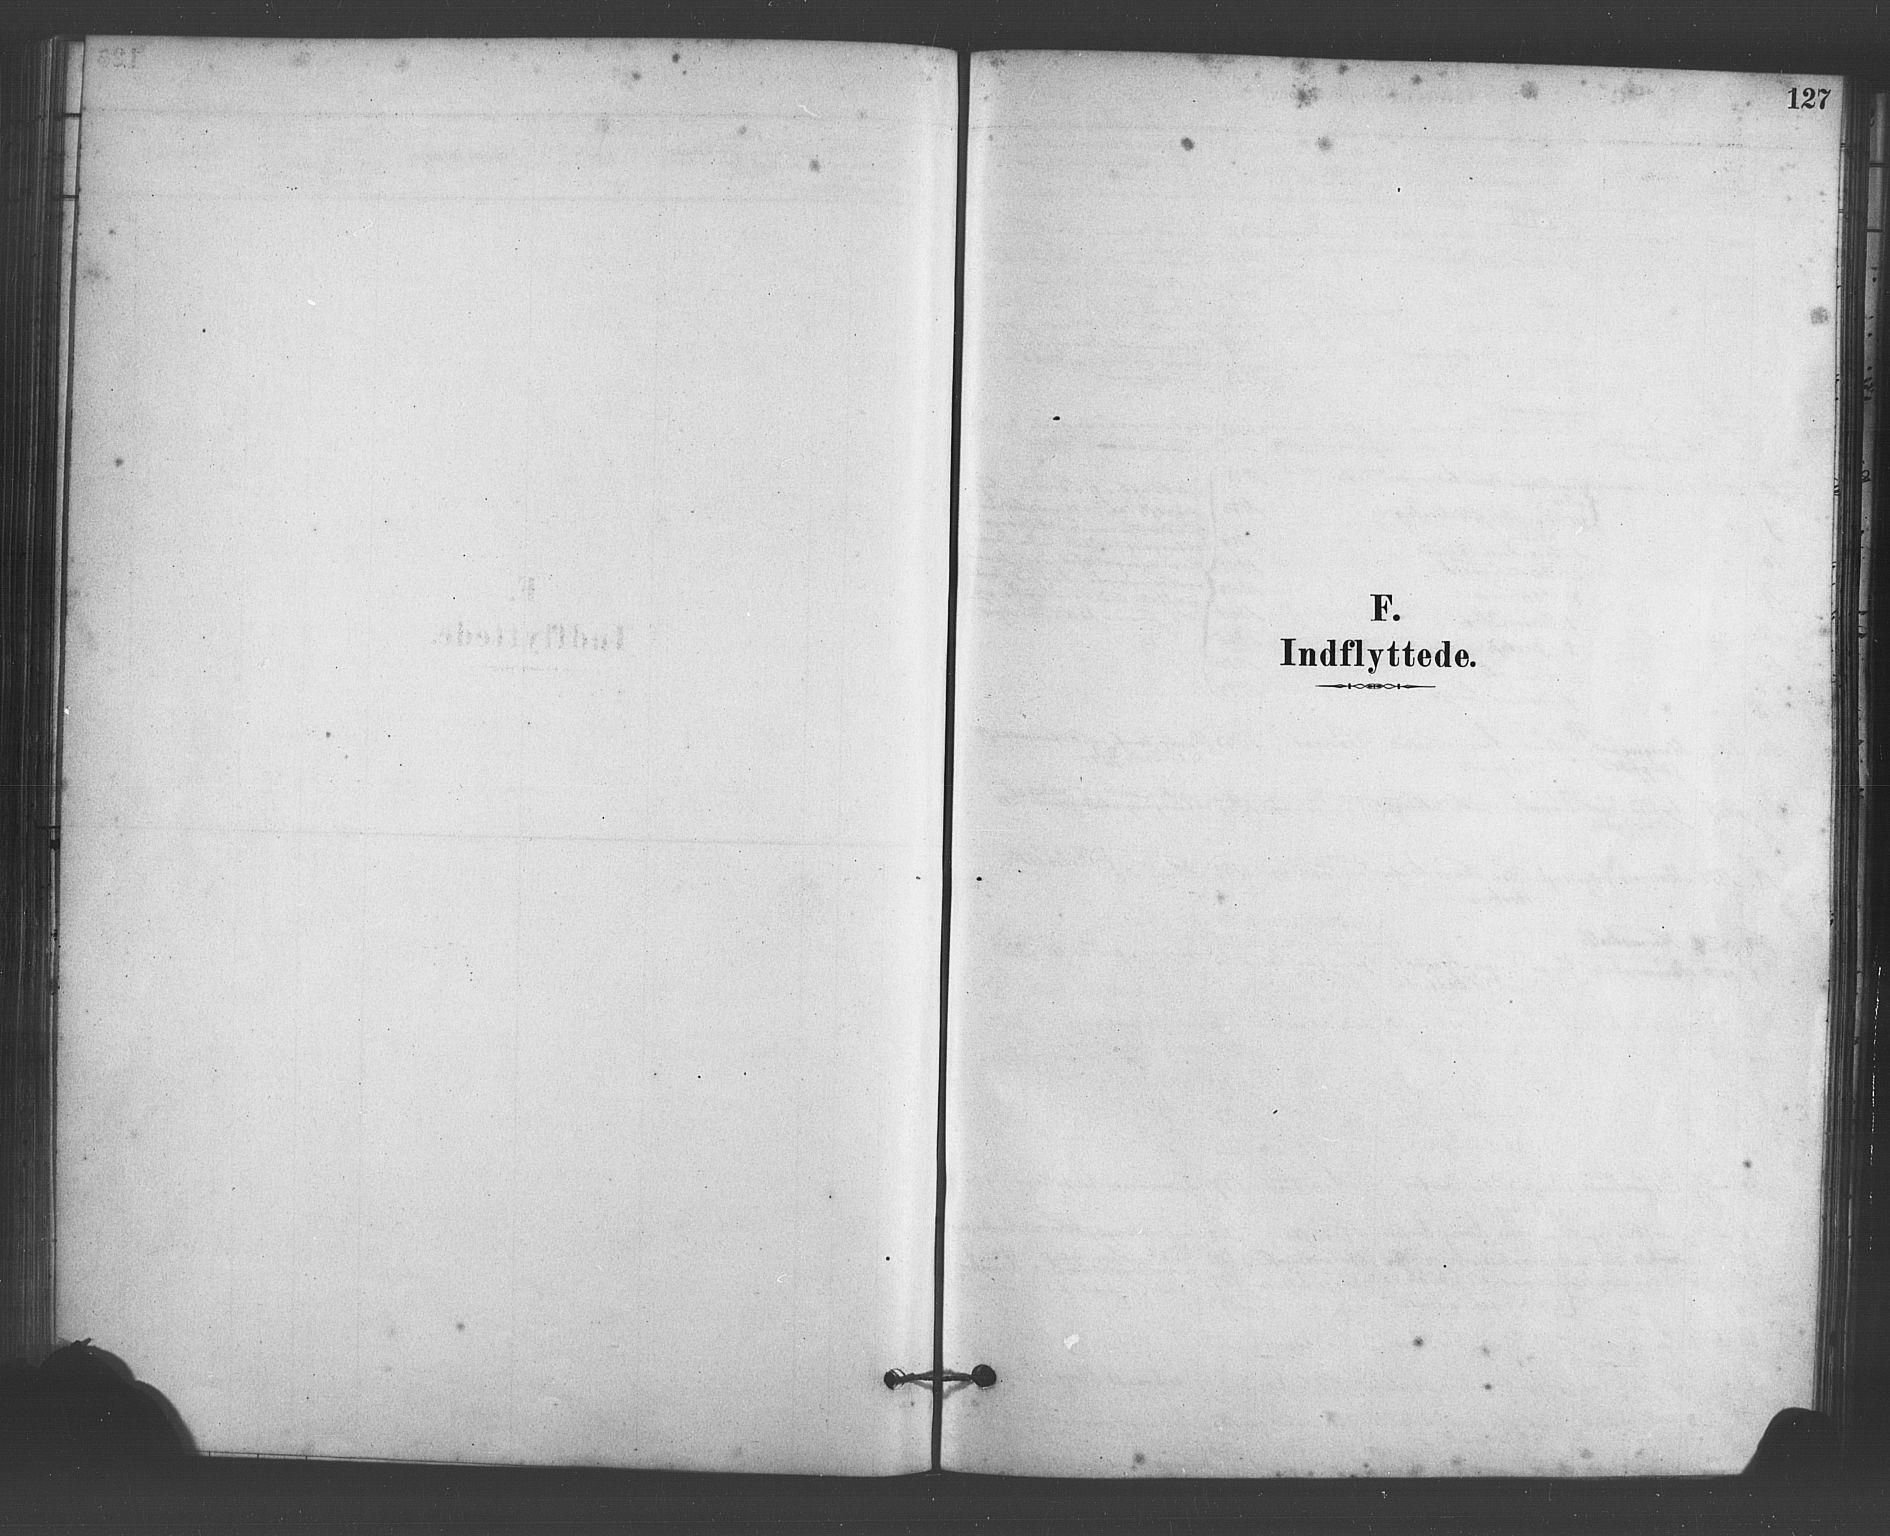 SAB, Fana Sokneprestembete, H/Haa/Haab/L0001: Ministerialbok nr. B 1, 1878-1889, s. 127